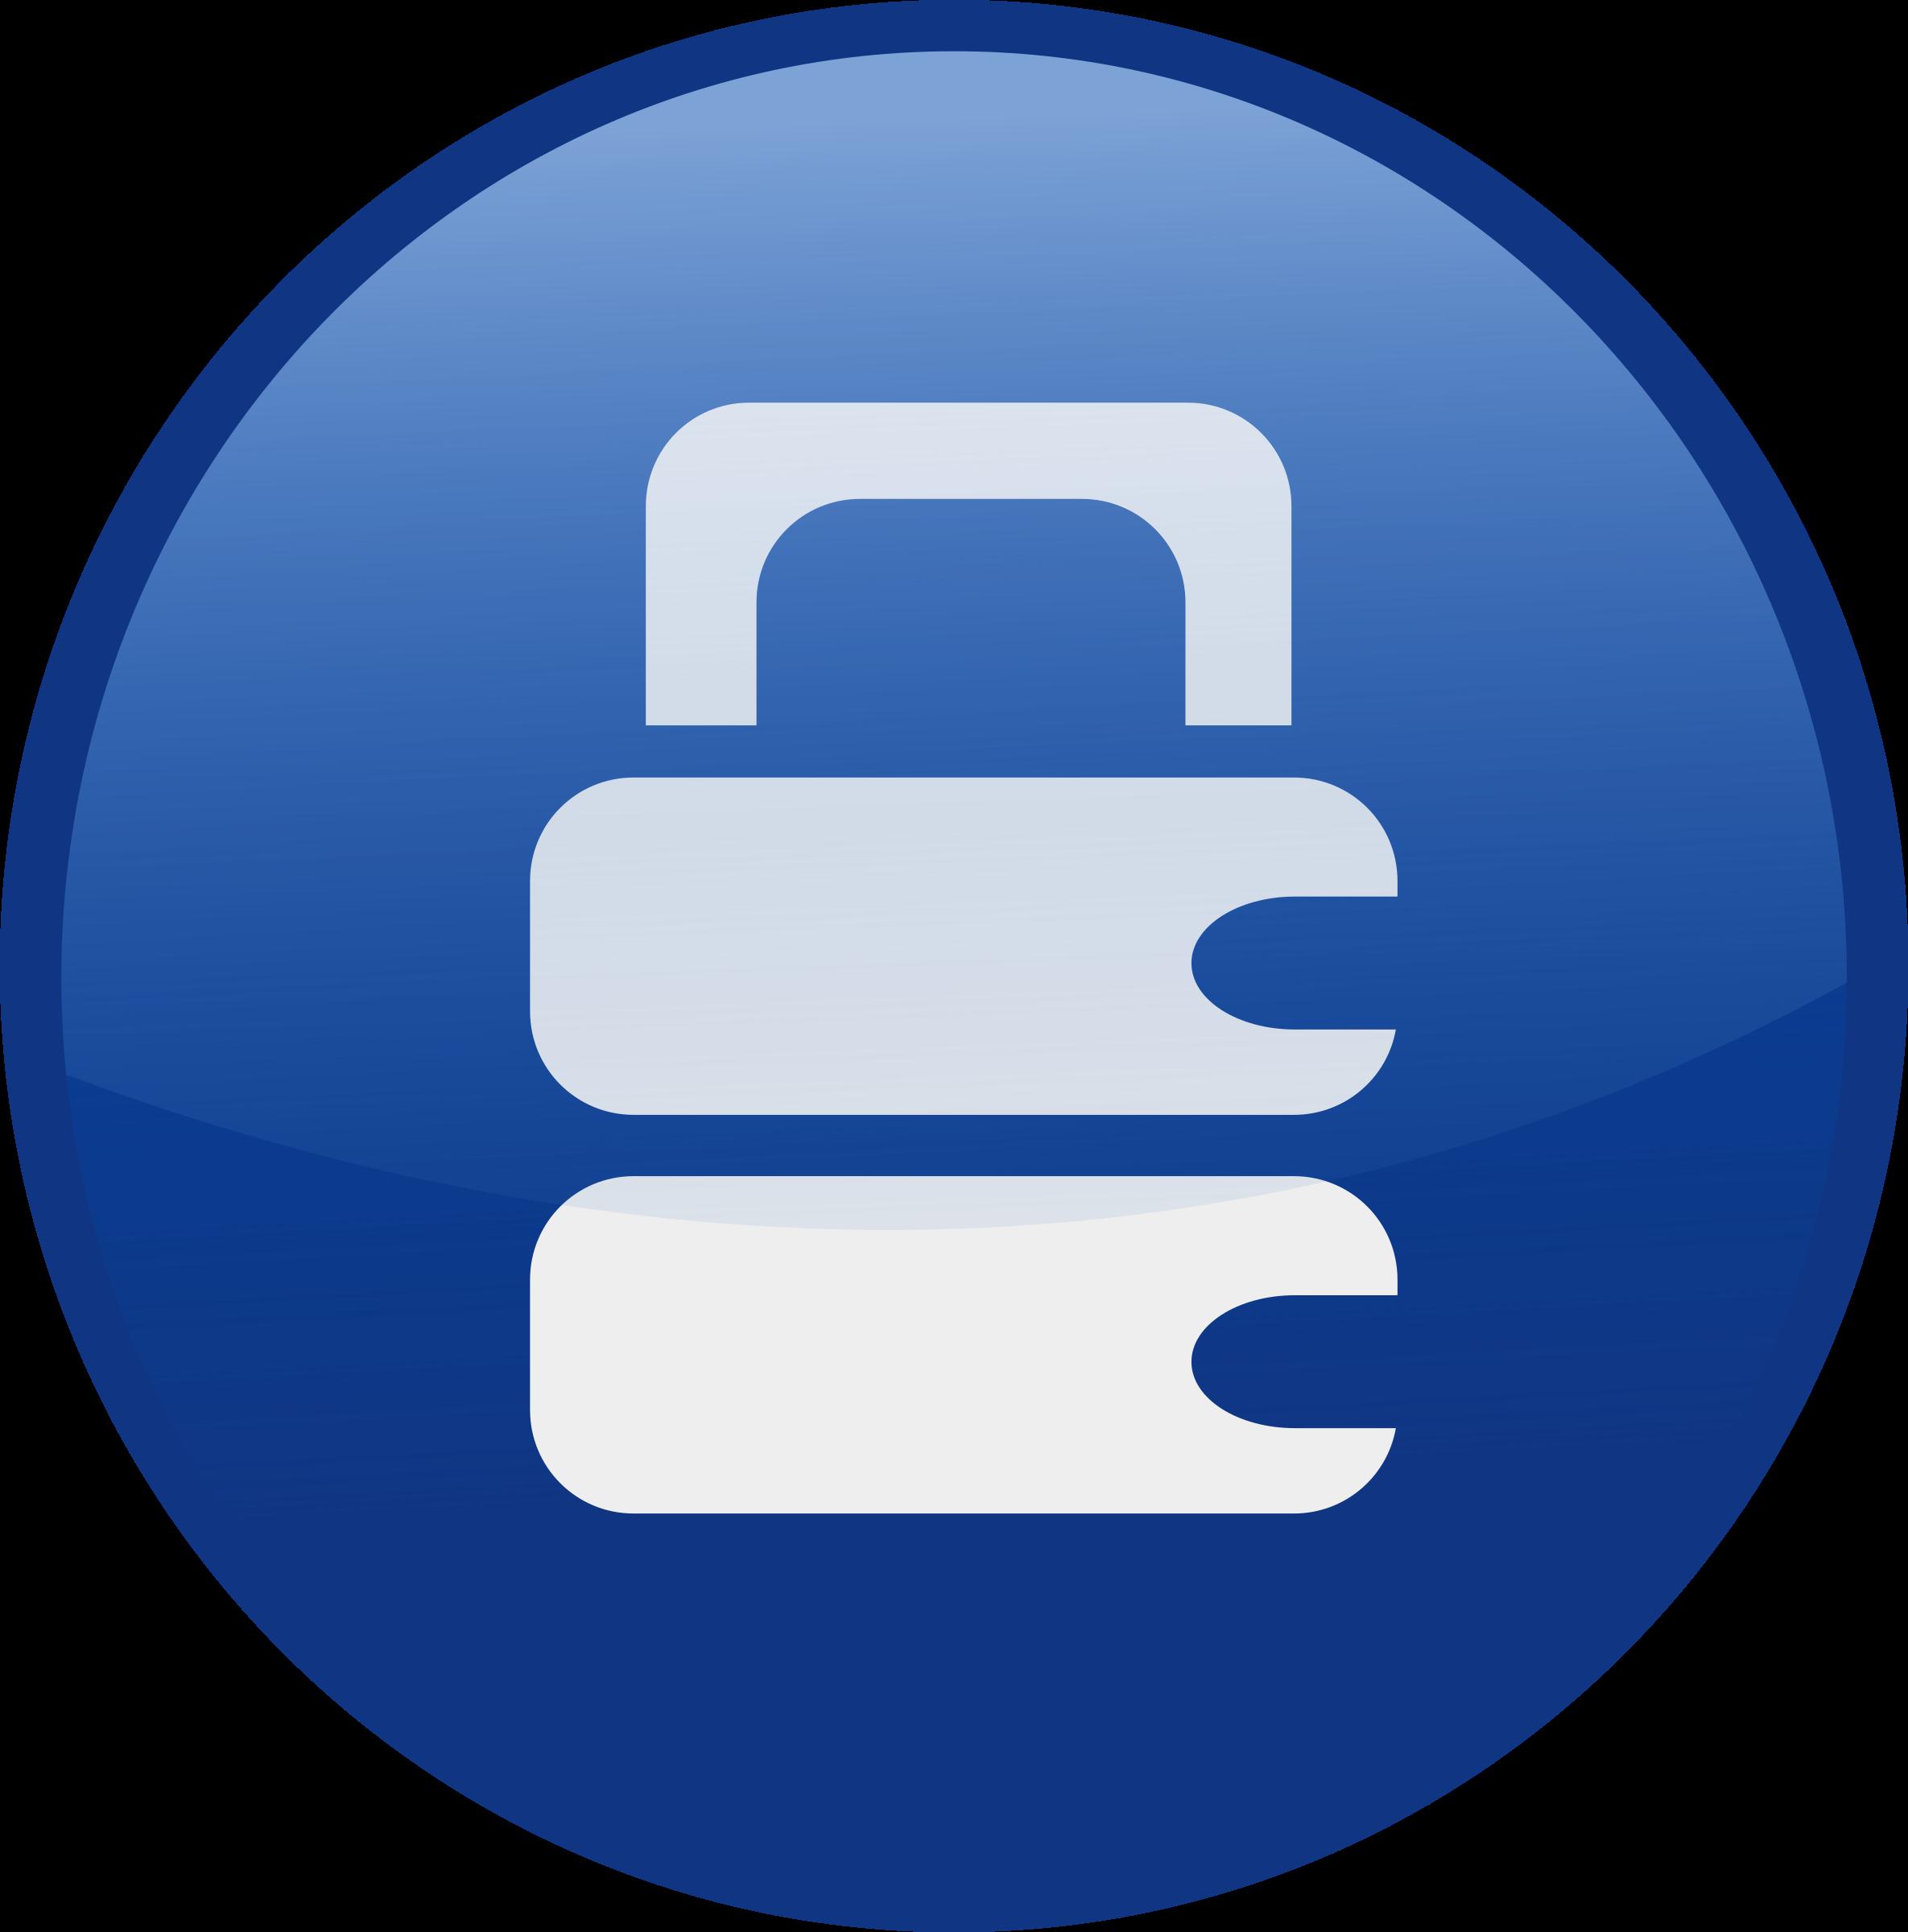 Lock clipart blue. Locked big image png